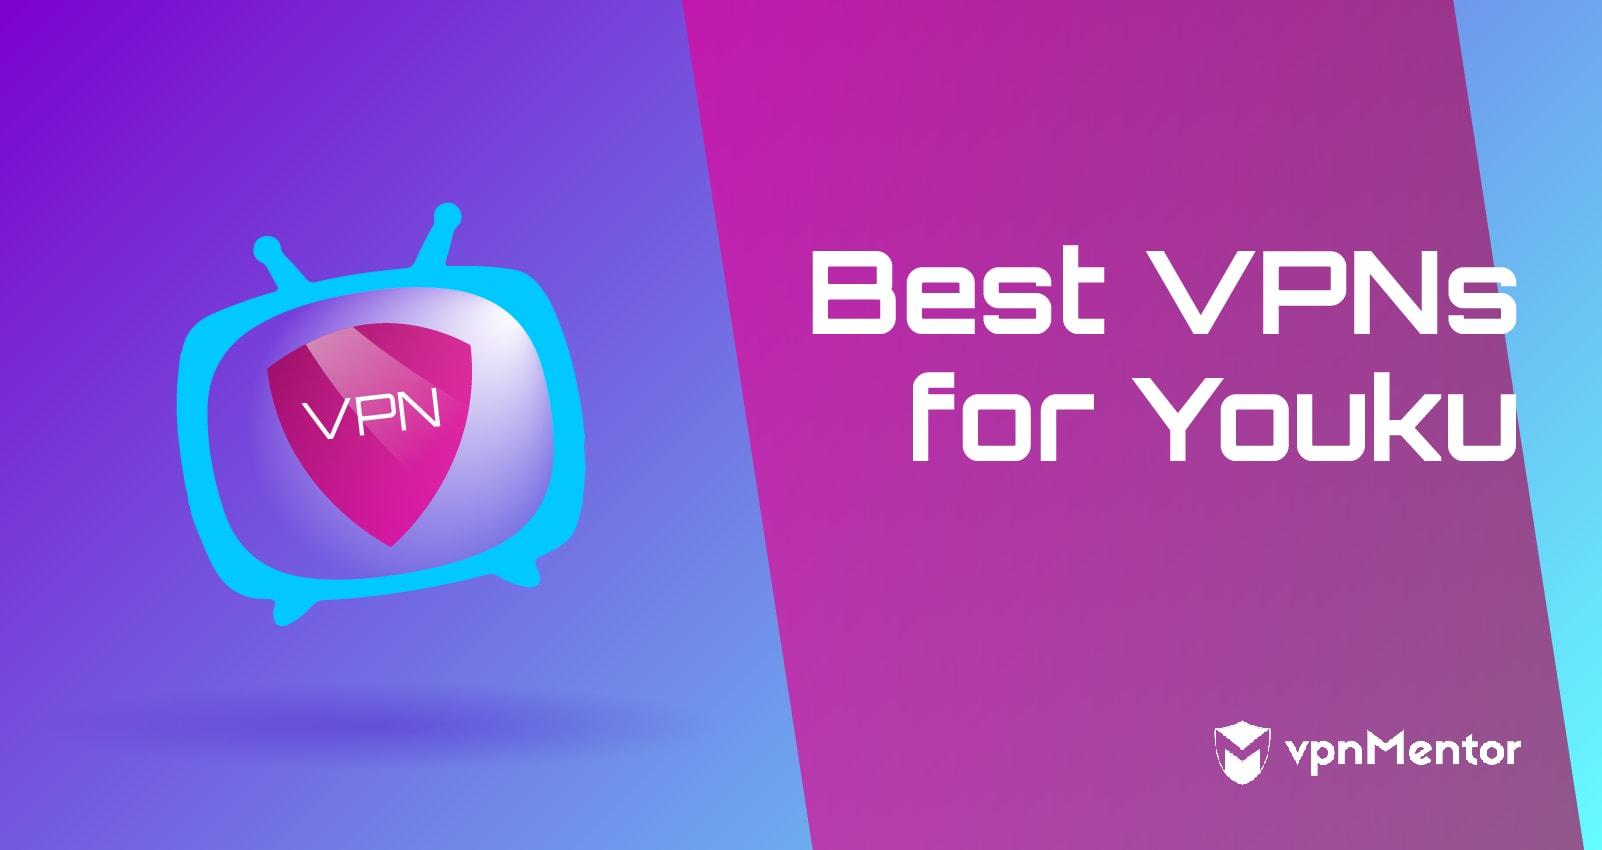 VPNs for Youku